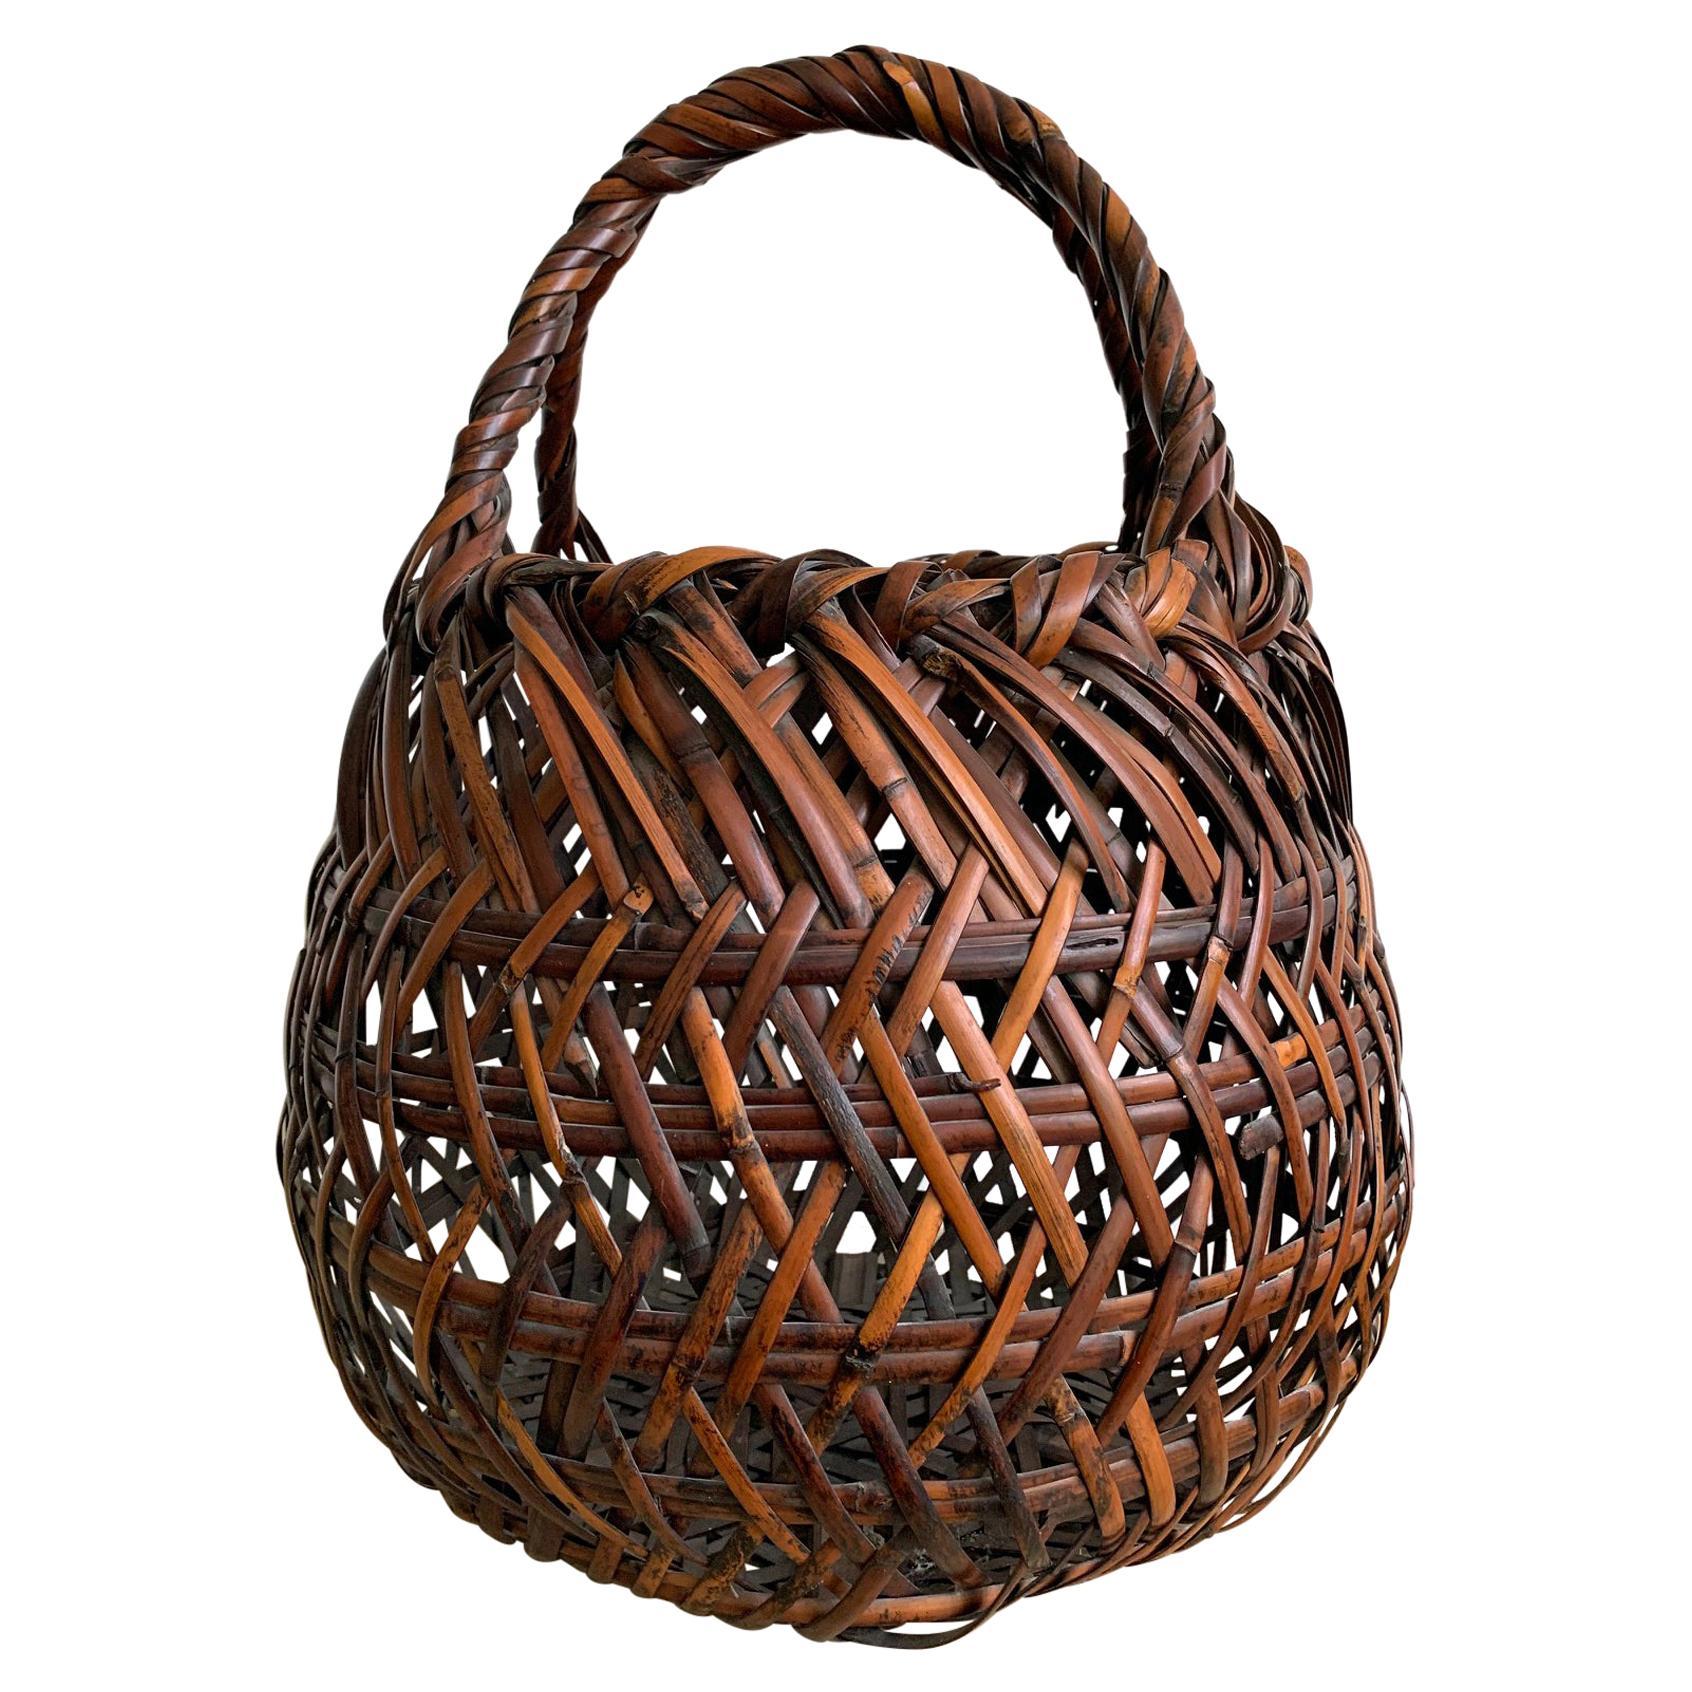 Japanese Bamboo Ikebana Basket by Yamamoto Chikuryosai I Shoen